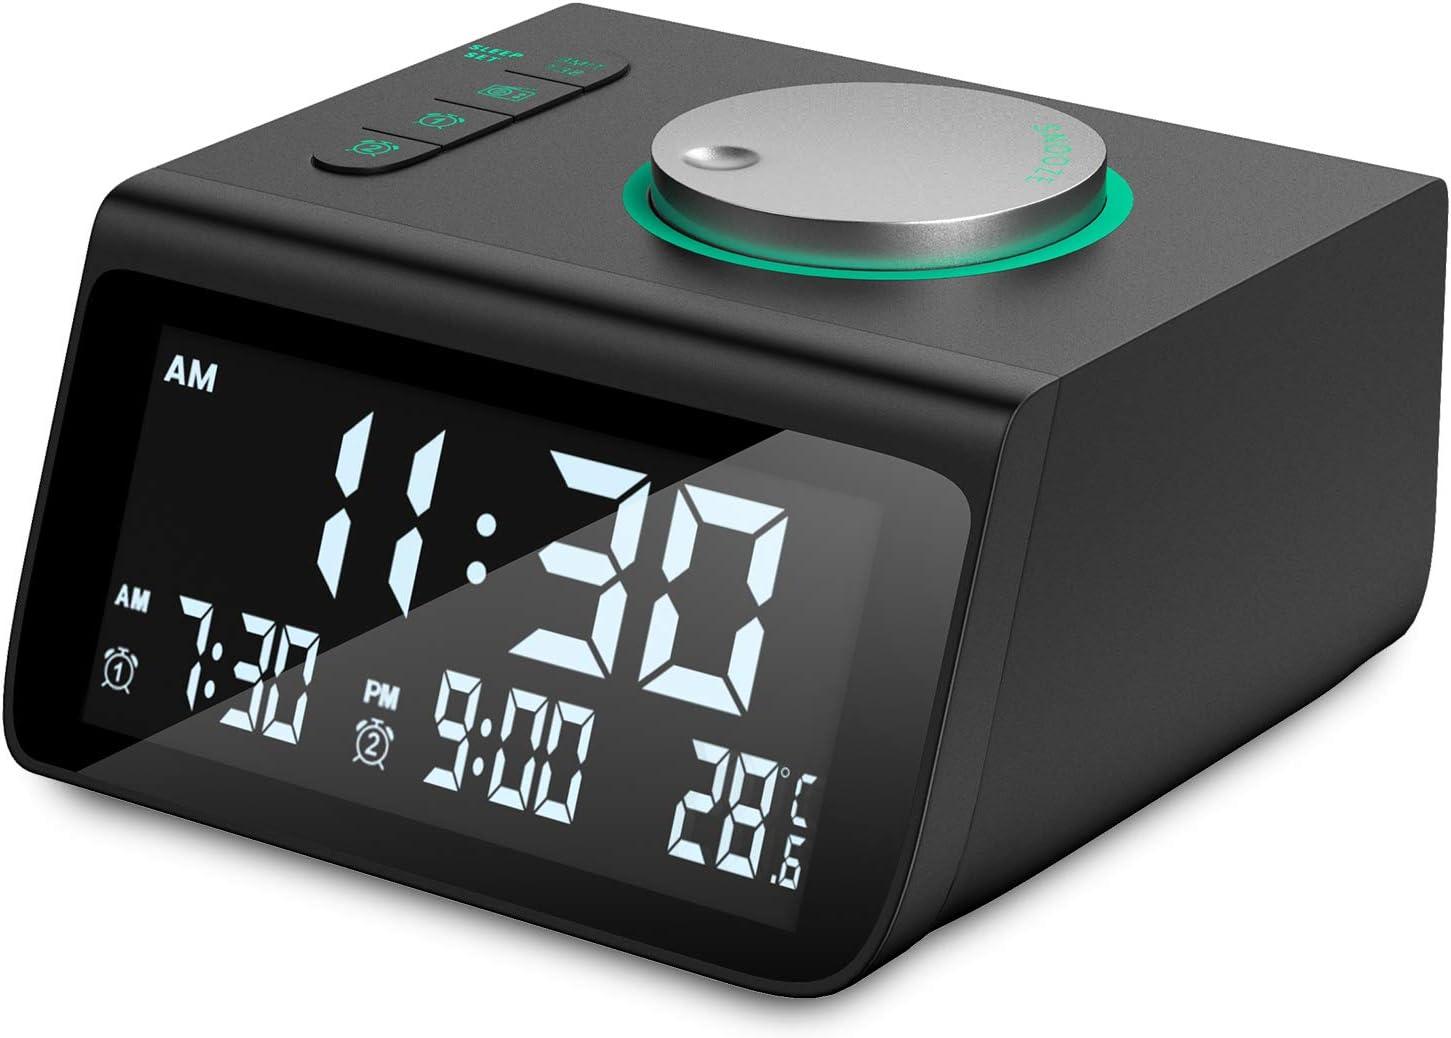 Digital Alarm Clock, Dekala Small Alarm Clocks Radio, with FM Radio, Dual Alarm, Dual USB Charging Ports, Battery Backup for Bedroom, Desk, Office